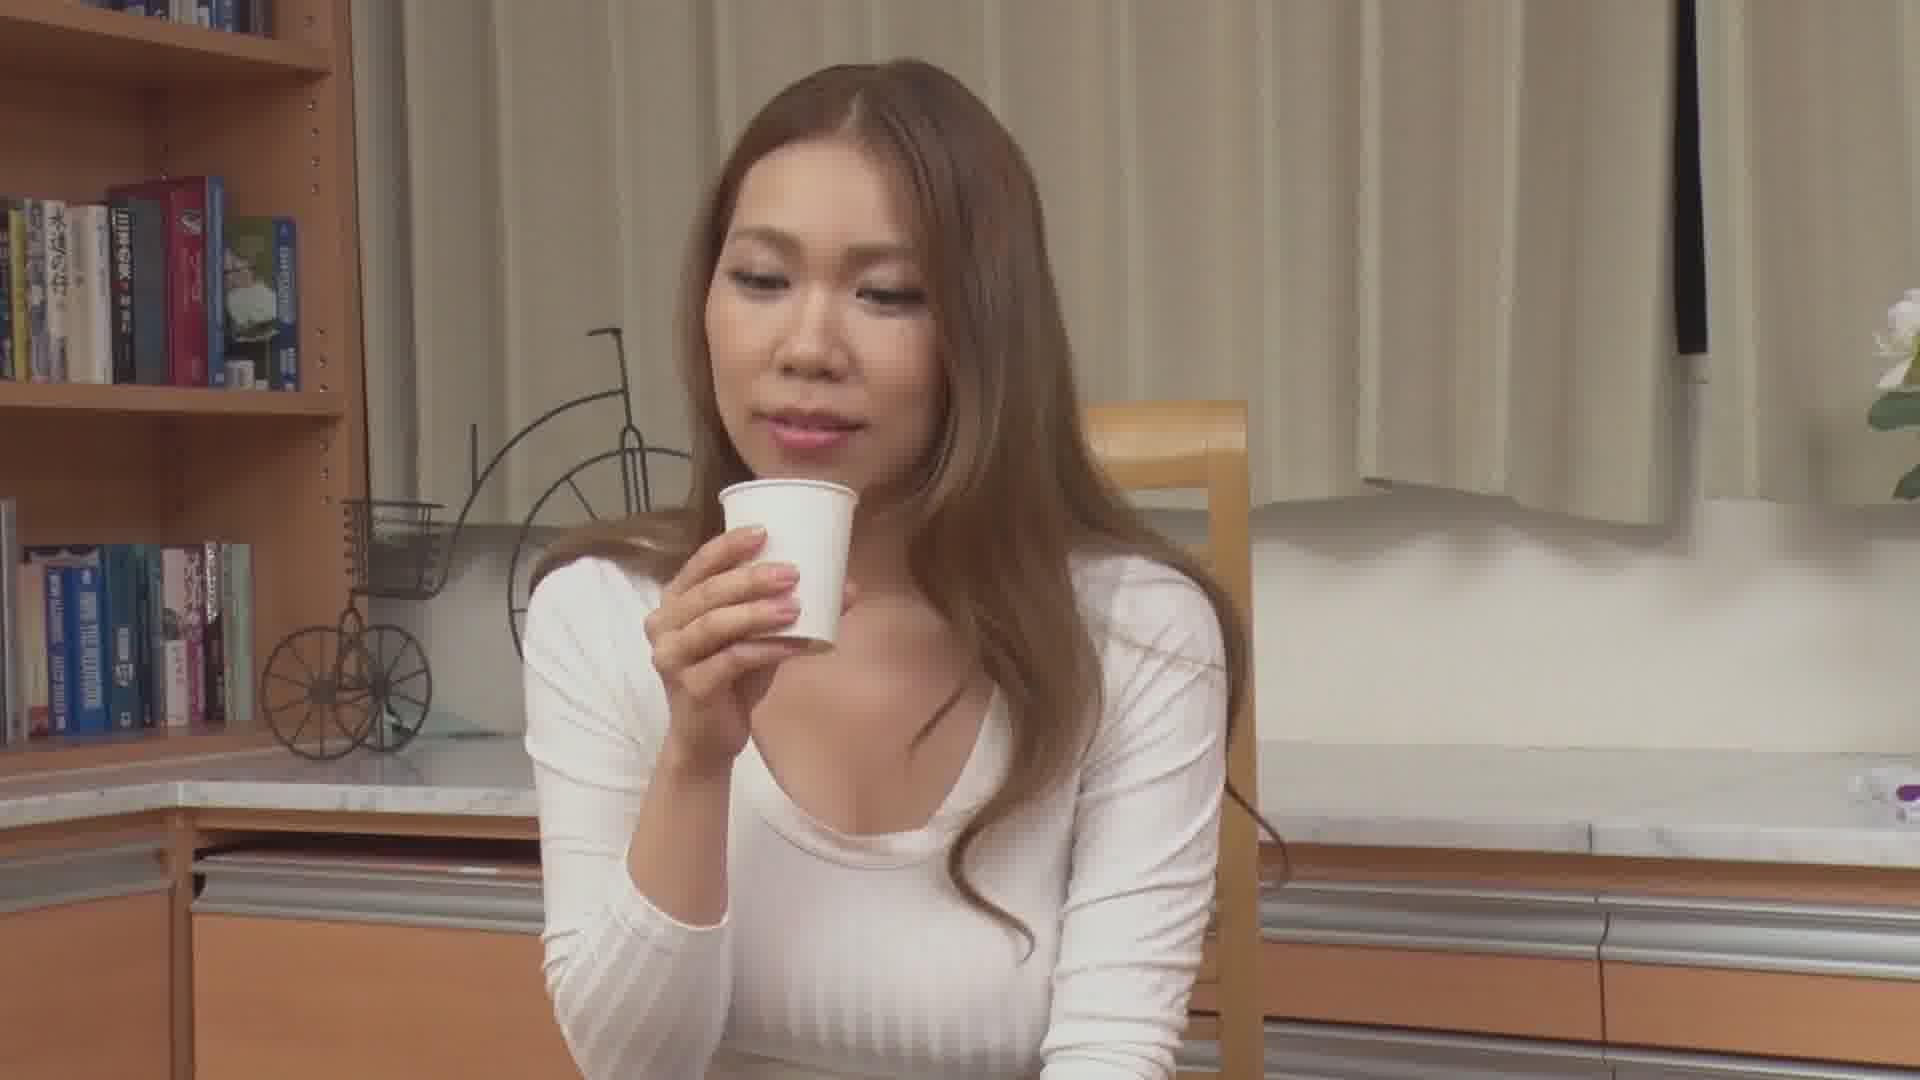 THE 未公開 ~恥じらいのお漏らし大作戦7~ - 鈴村いろは【巨乳・オナニー・放尿】